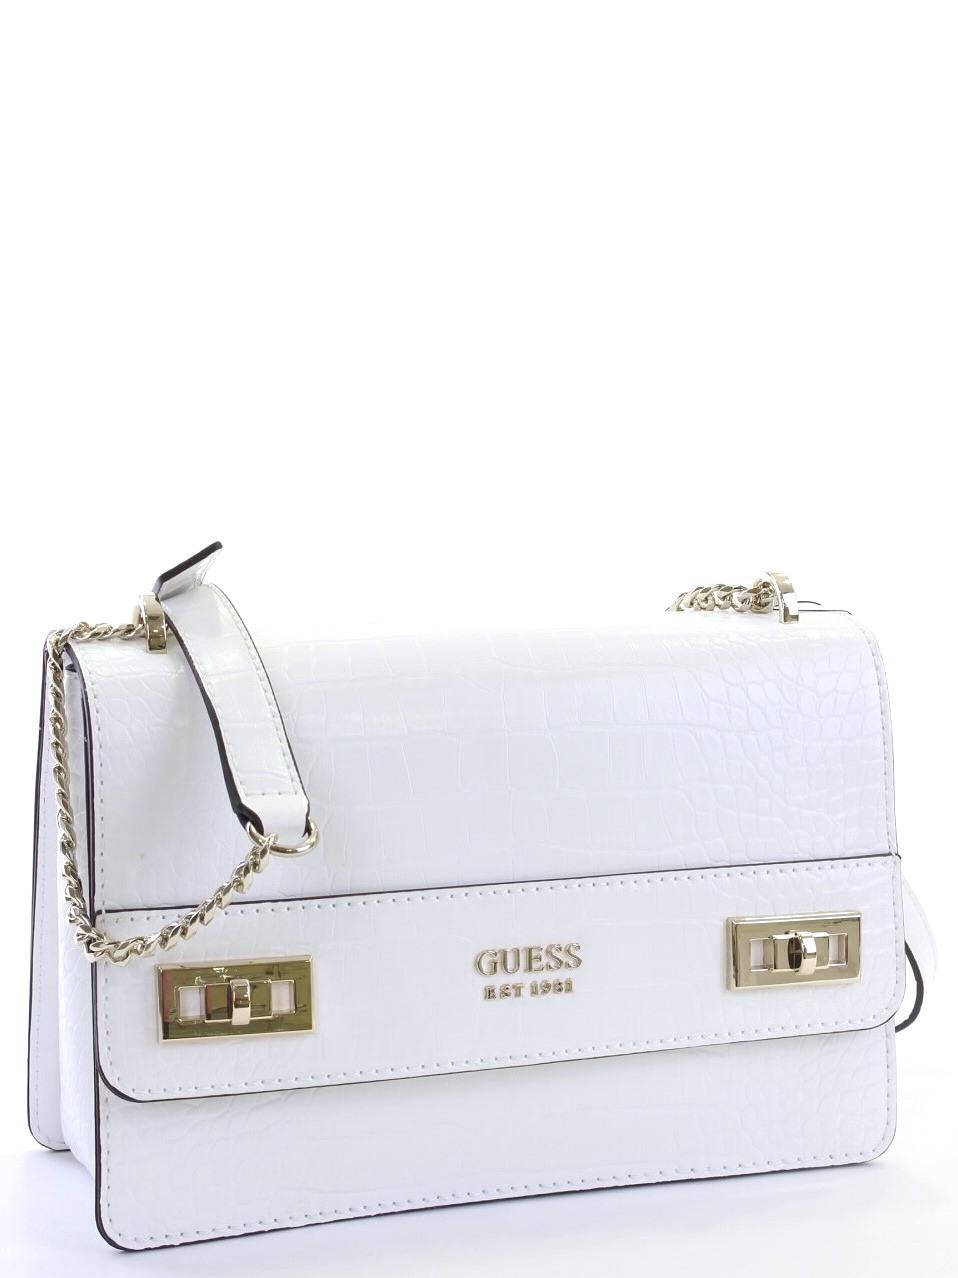 Shoulder Bags Guess - 465 HWCG78 70210